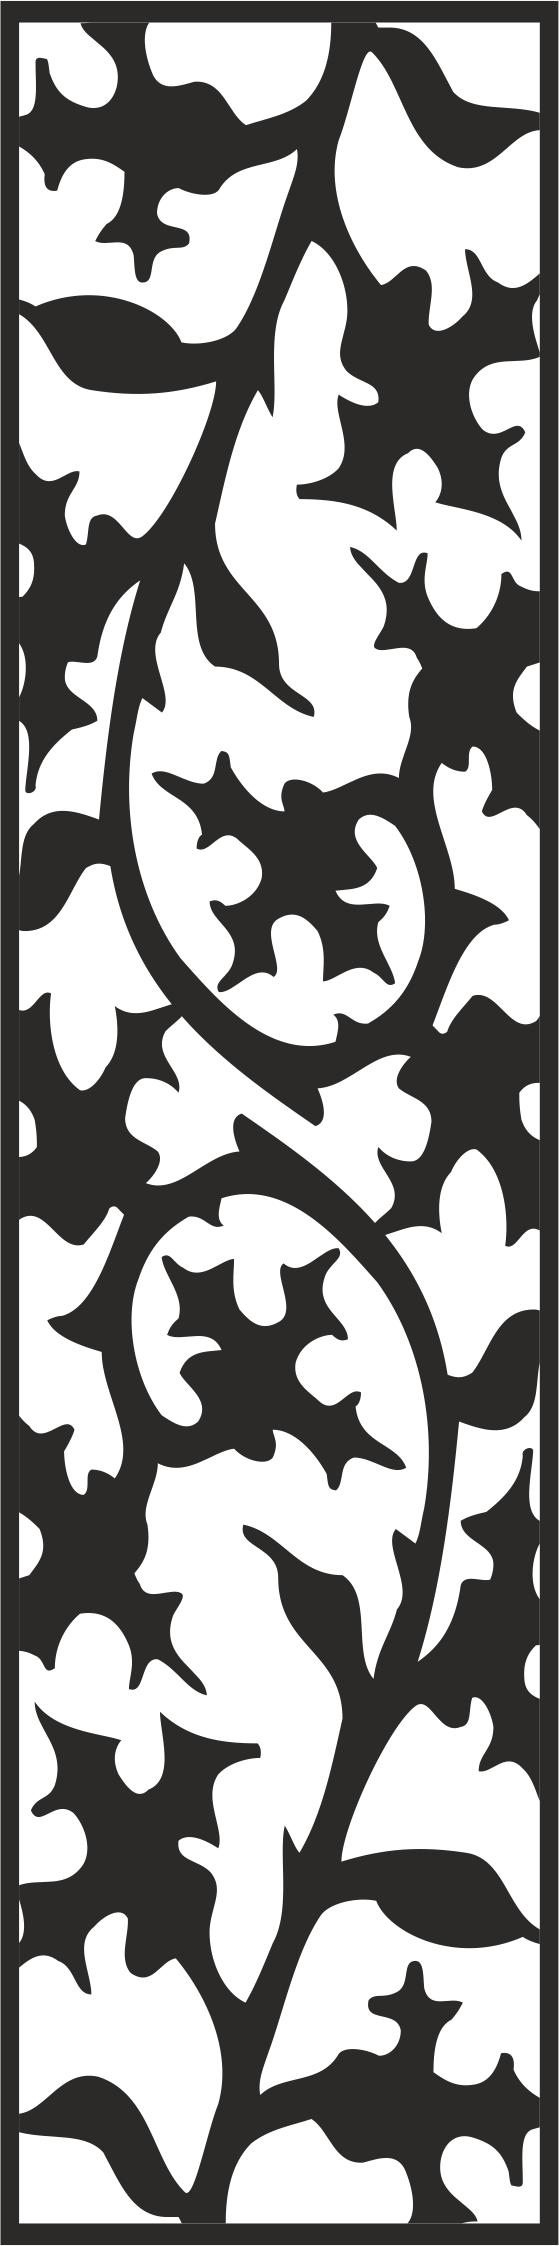 Laser Cut Floral Pattern 222 Free CDR Vectors Art